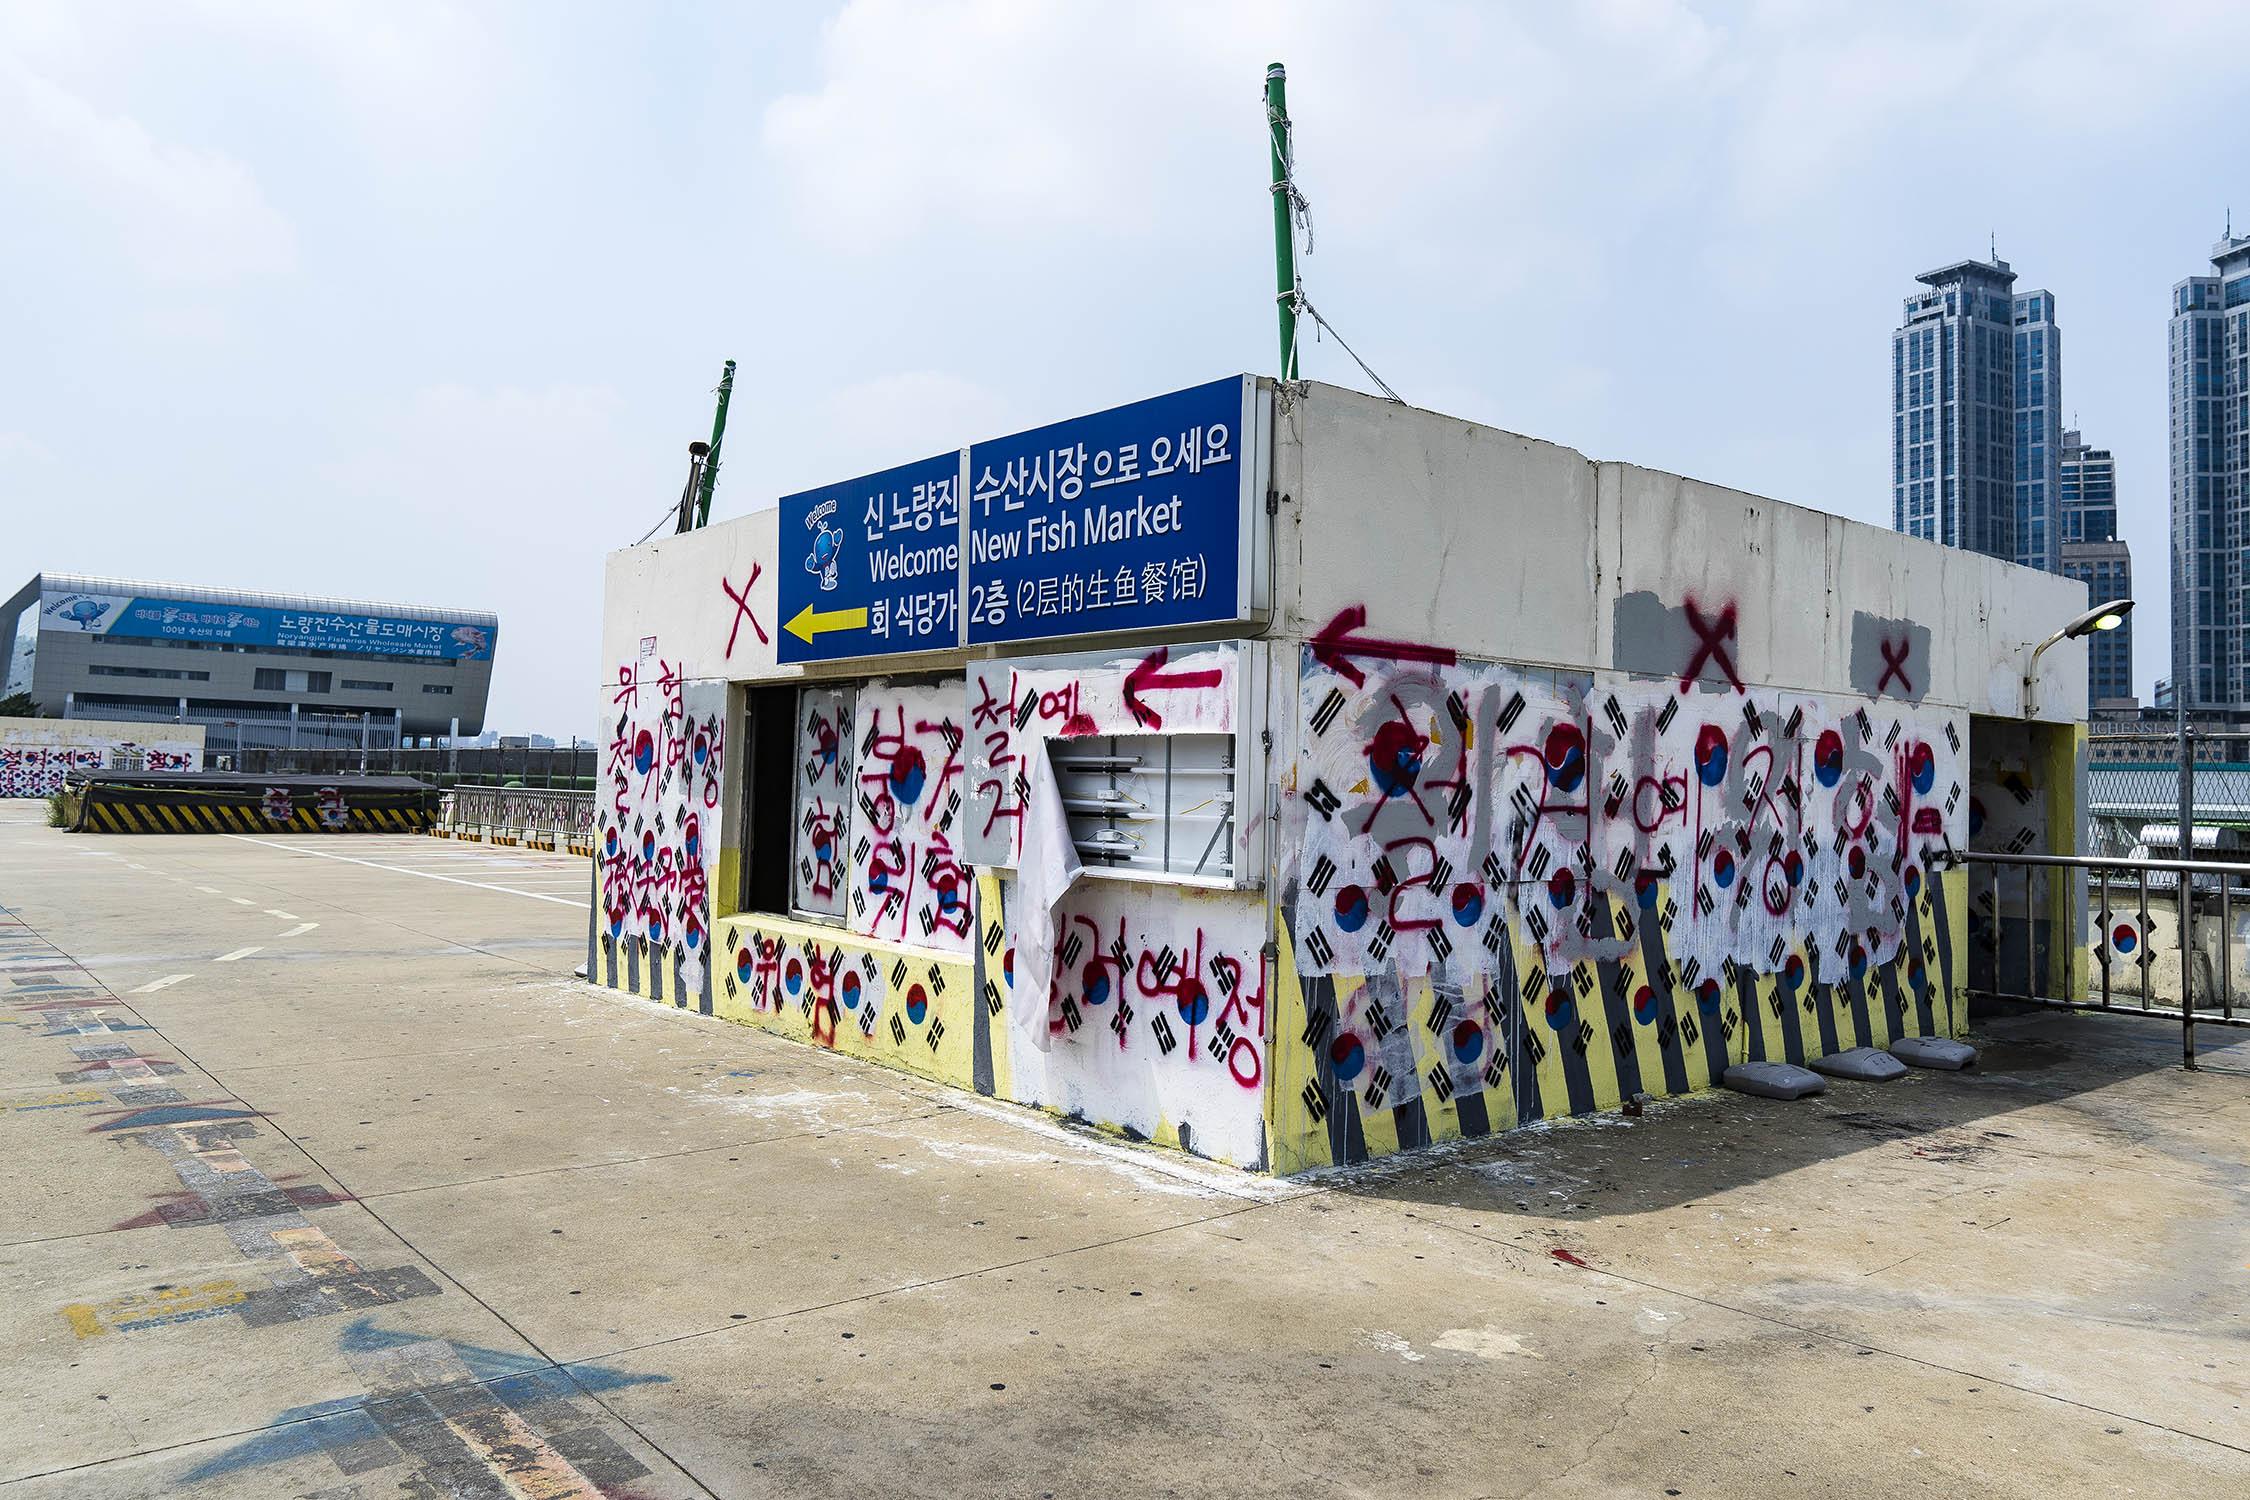 noryangjin fish market sign